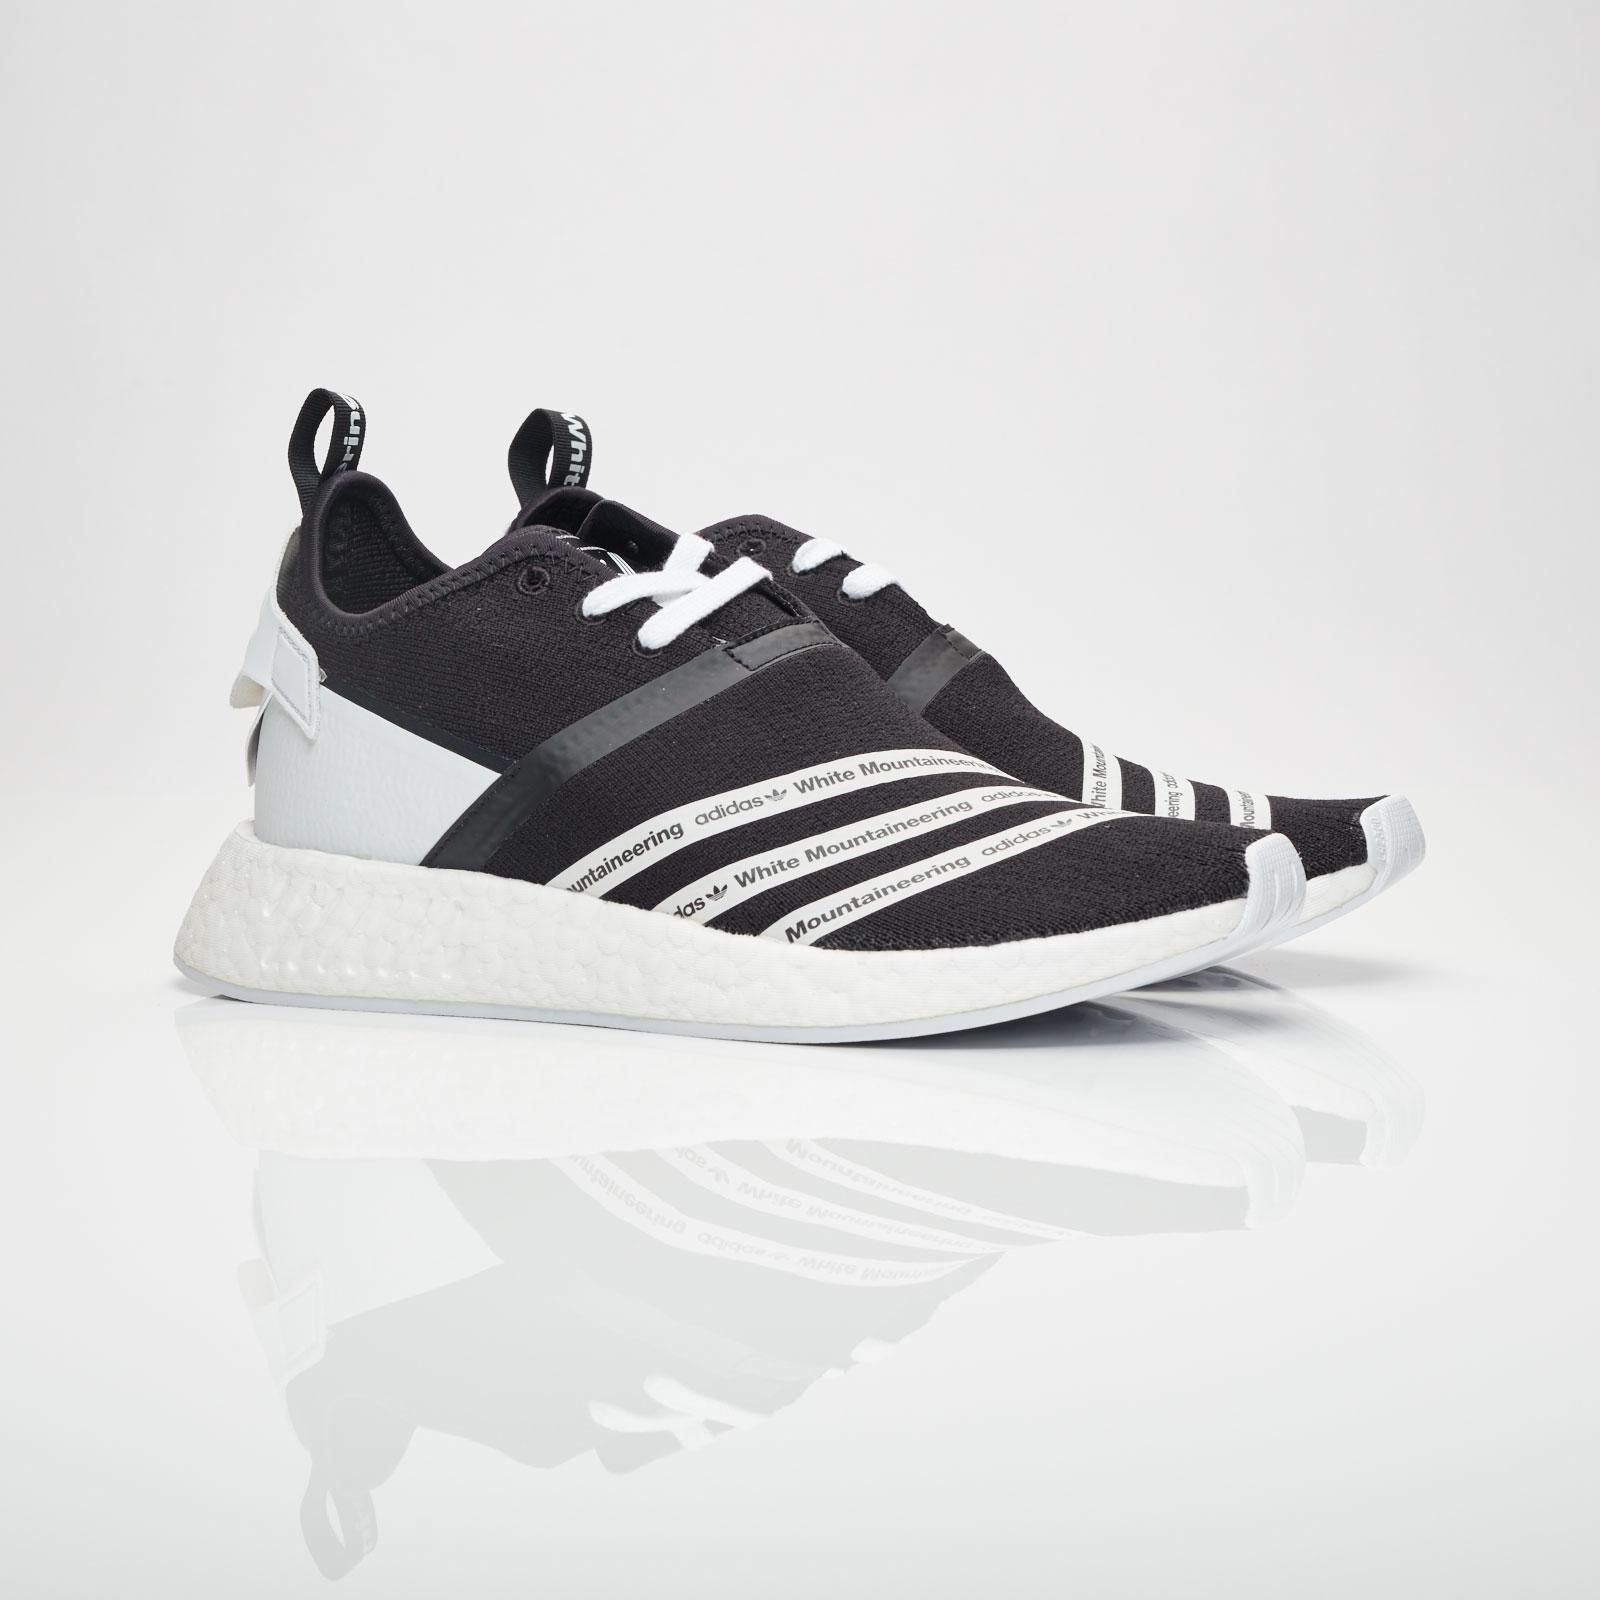 adidas nmd r2 pk da alpinismo cg3648 sneakersnstuff bianco